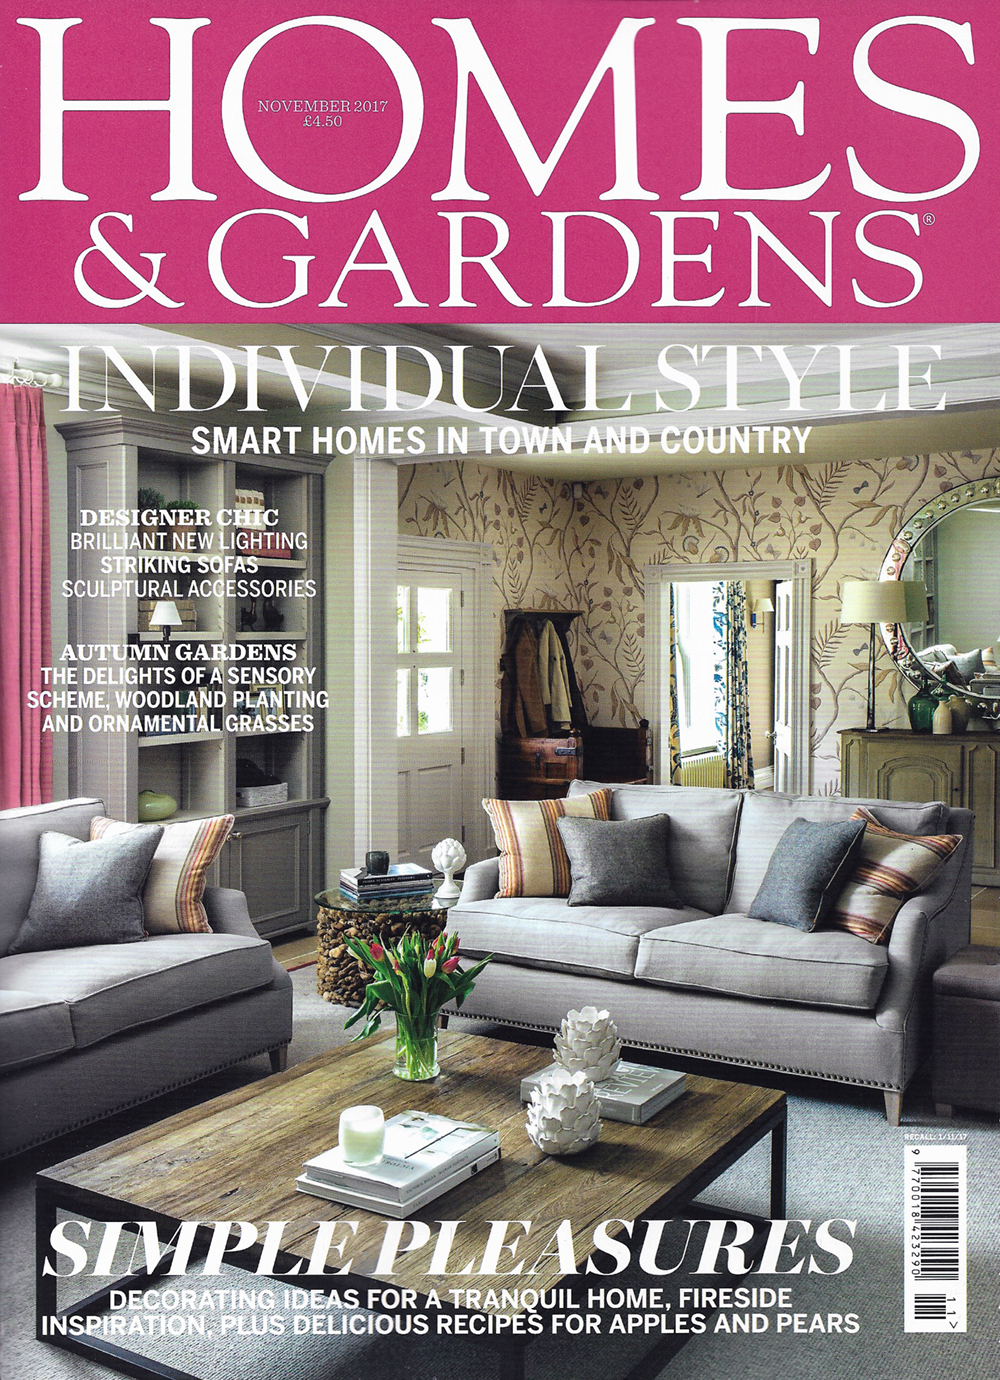 Homes & Gardens (November 2017)